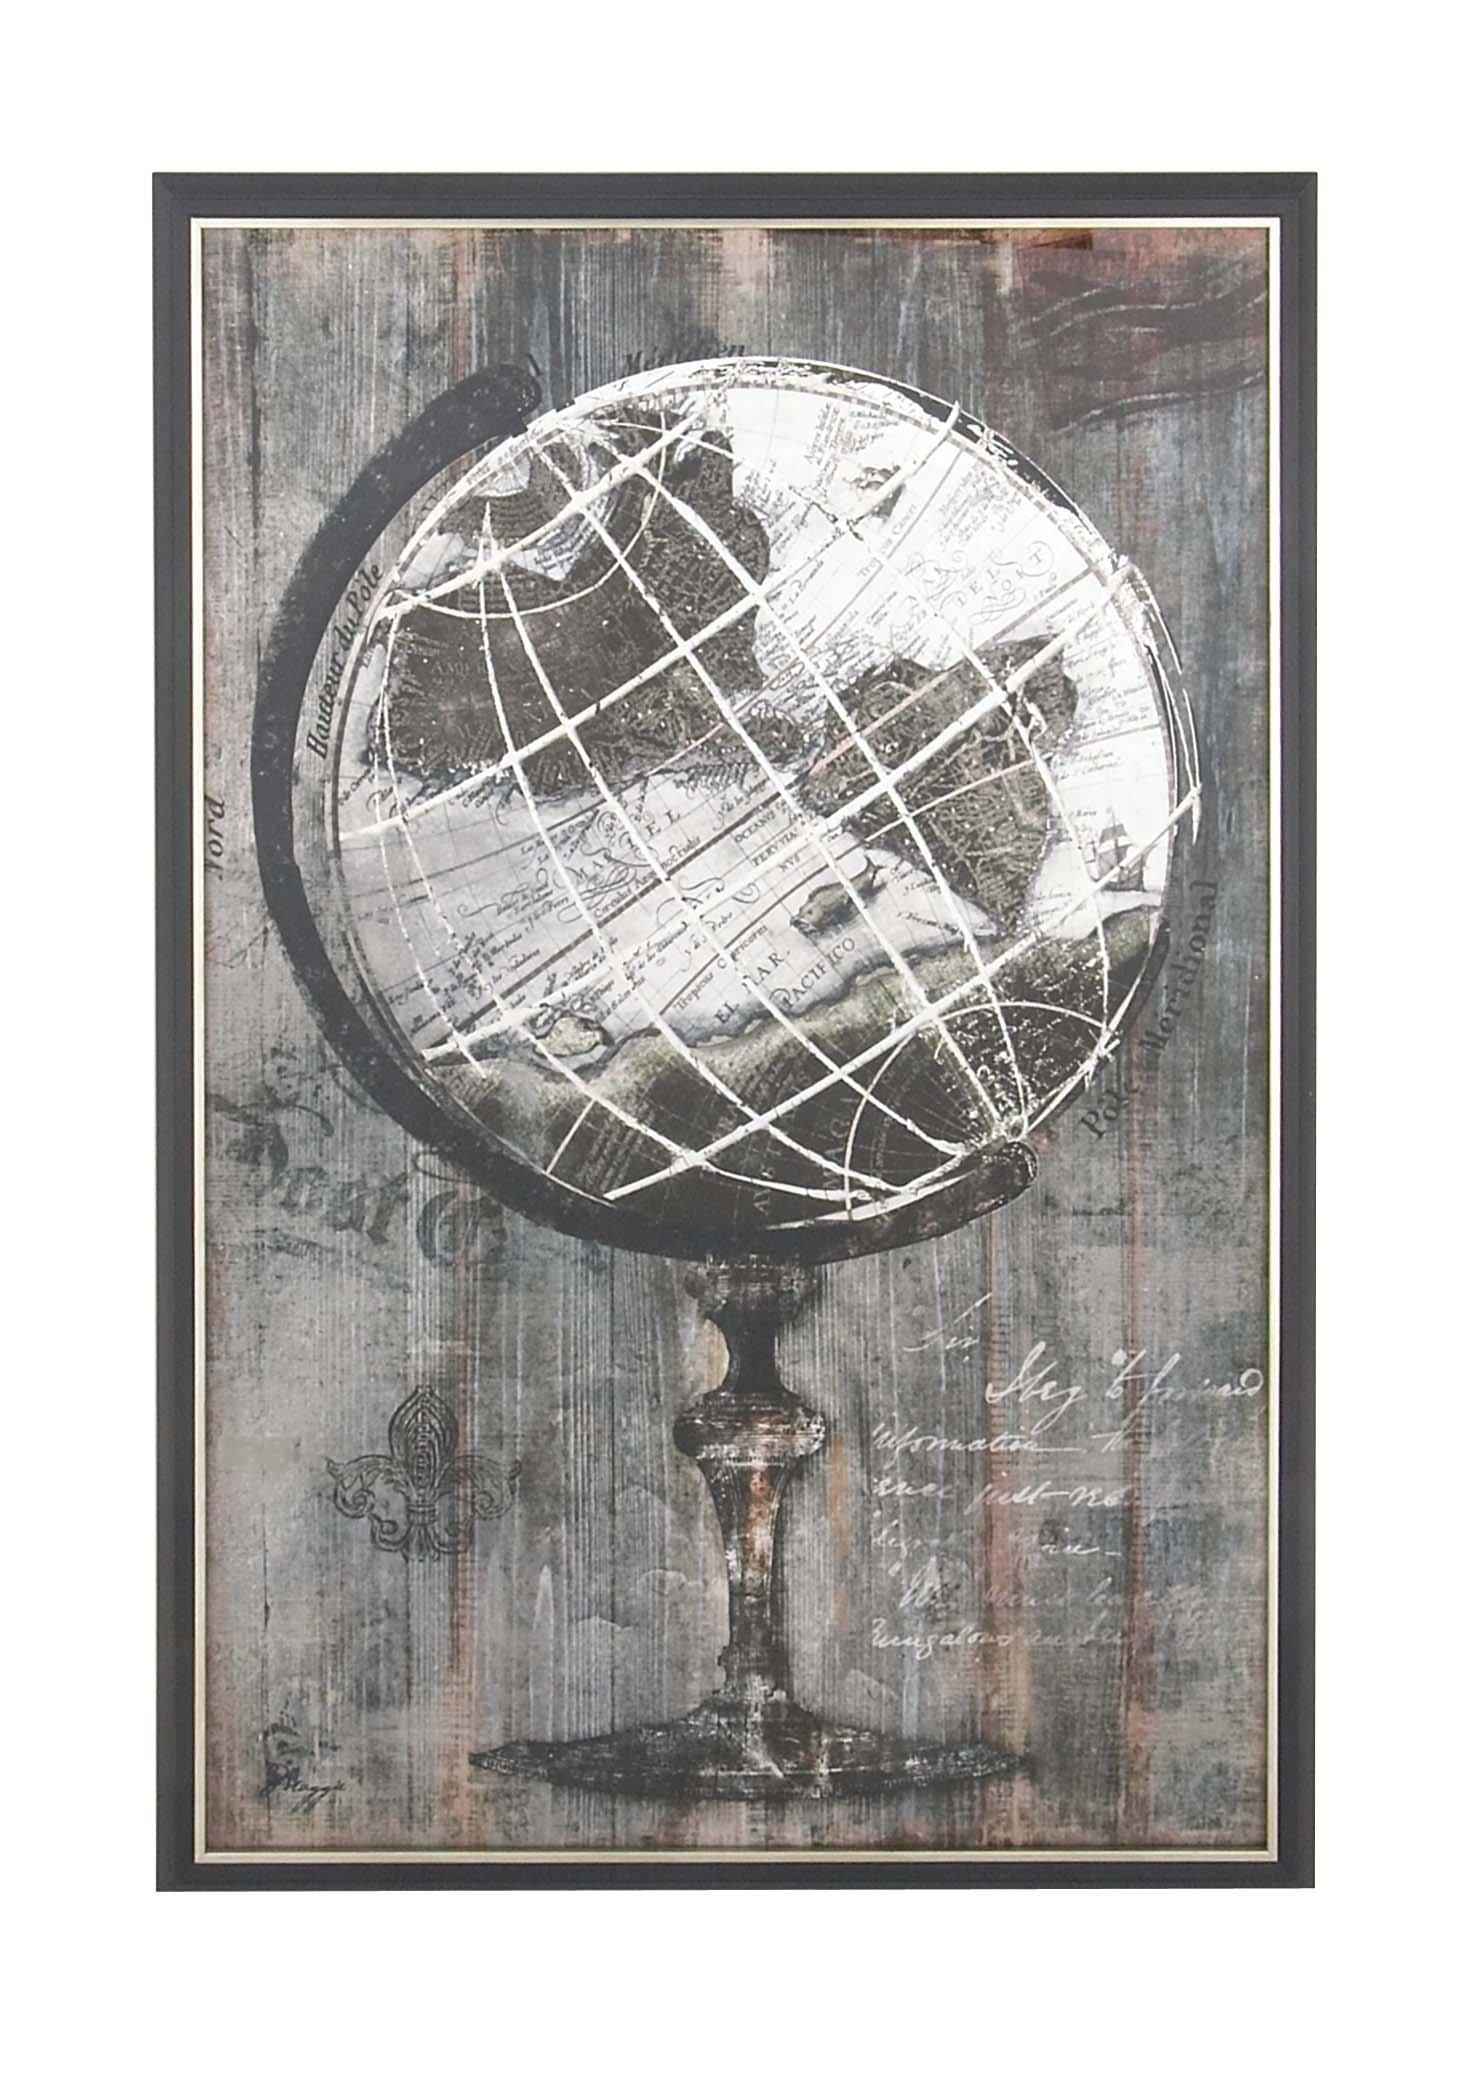 Deco 79 36660 Canvas Wall Art Black/Gray by Deco 79